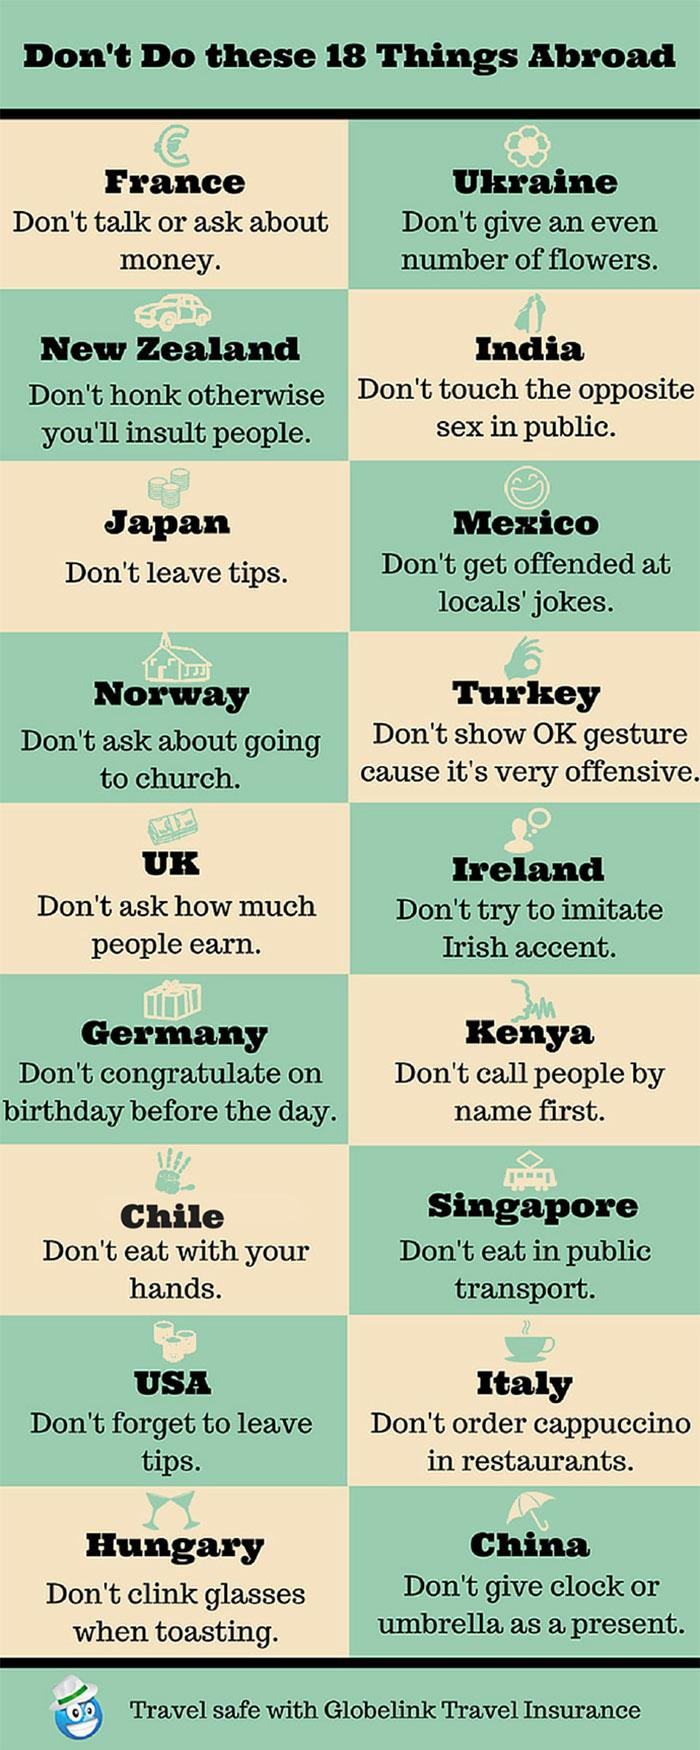 advice-countries-laws-around-the-world-traveling-international-globelink-1